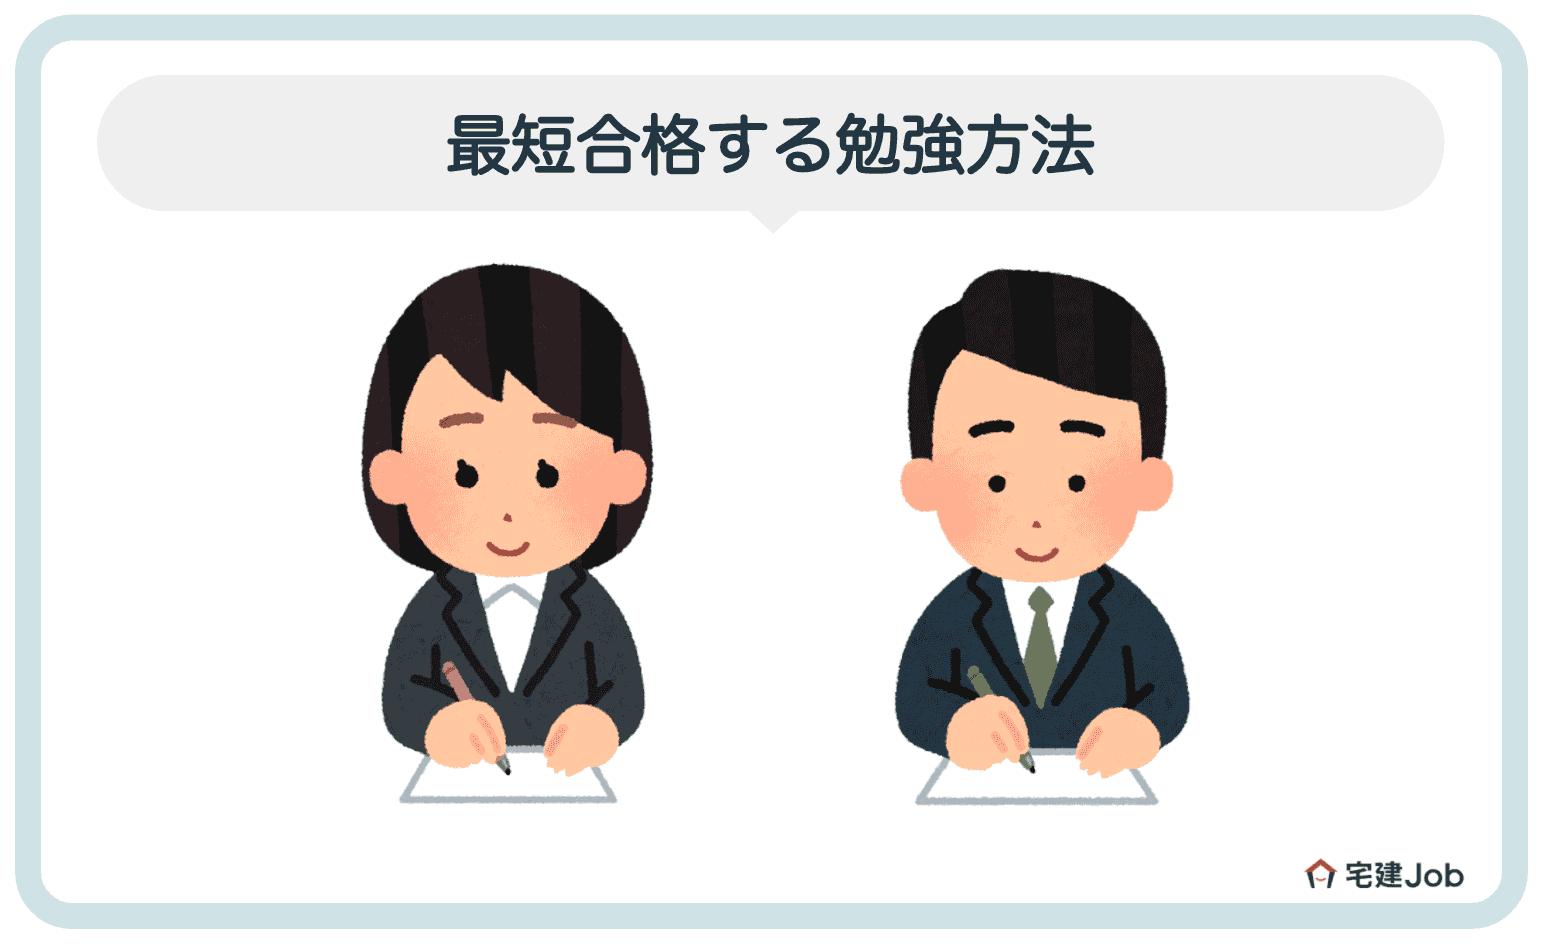 3.管理業務主任者に最短合格する勉強方法【勉強時間】